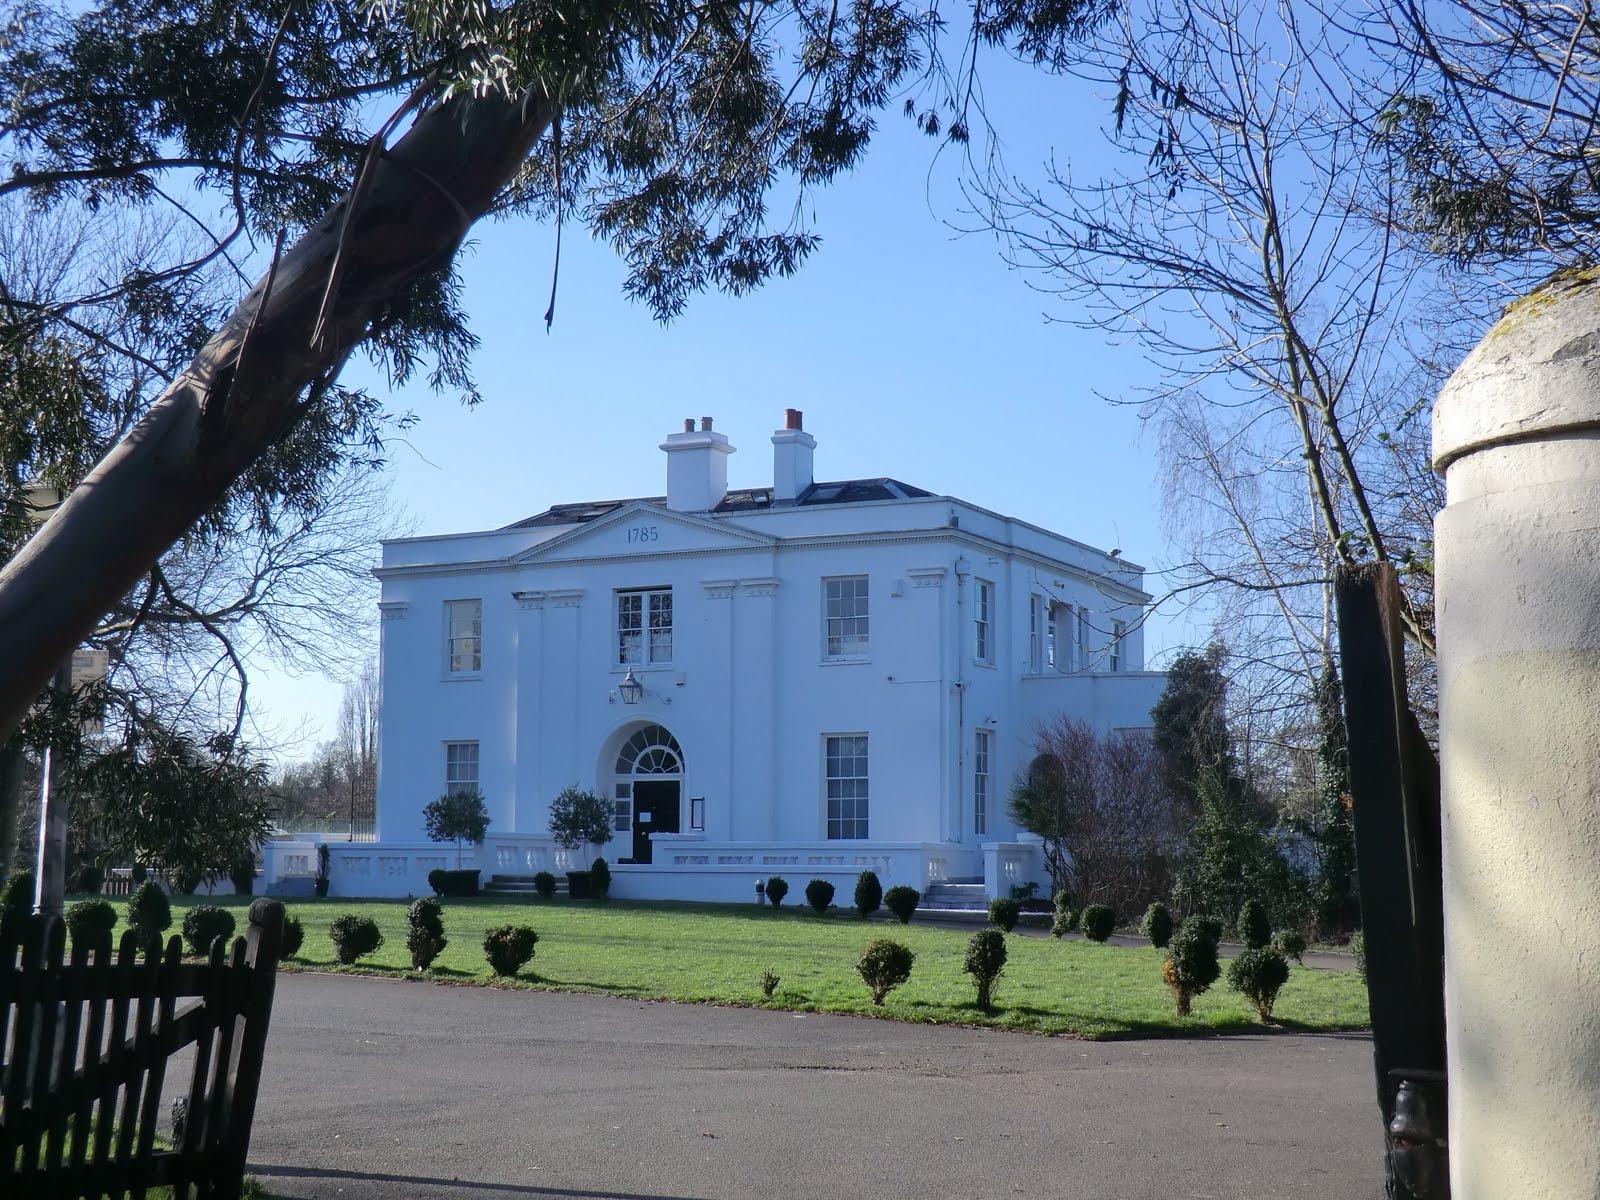 CIMG1589 Belair House, Dulwich